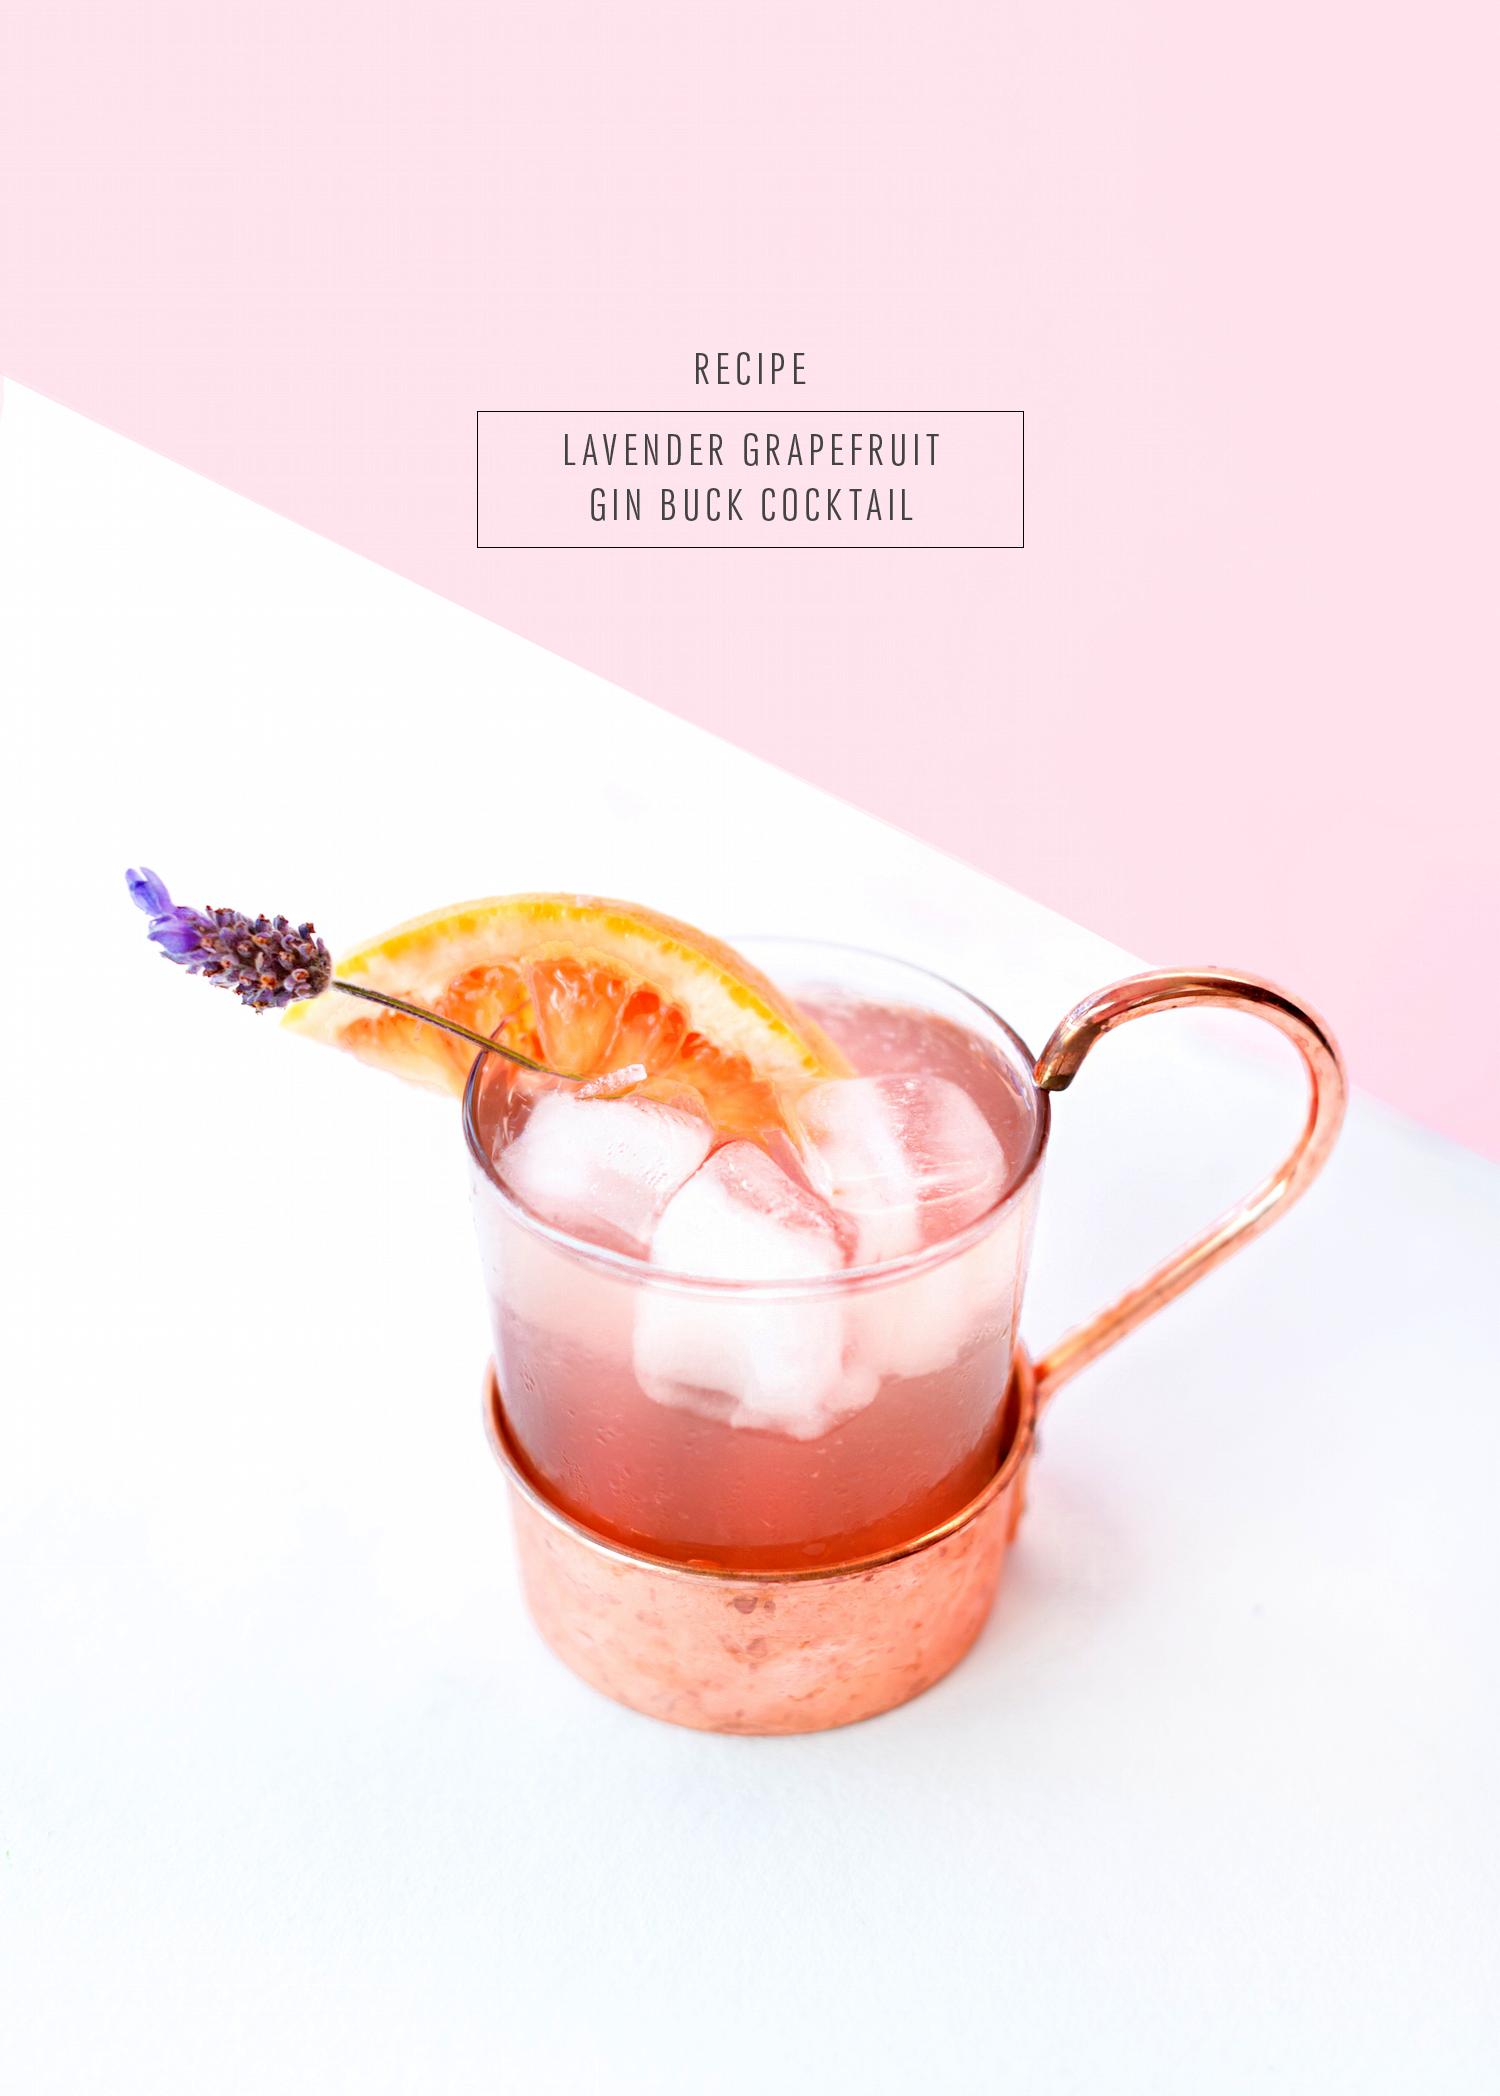 Lavender Grapefruit Gin Buck Cocktail #grapefruitcocktail